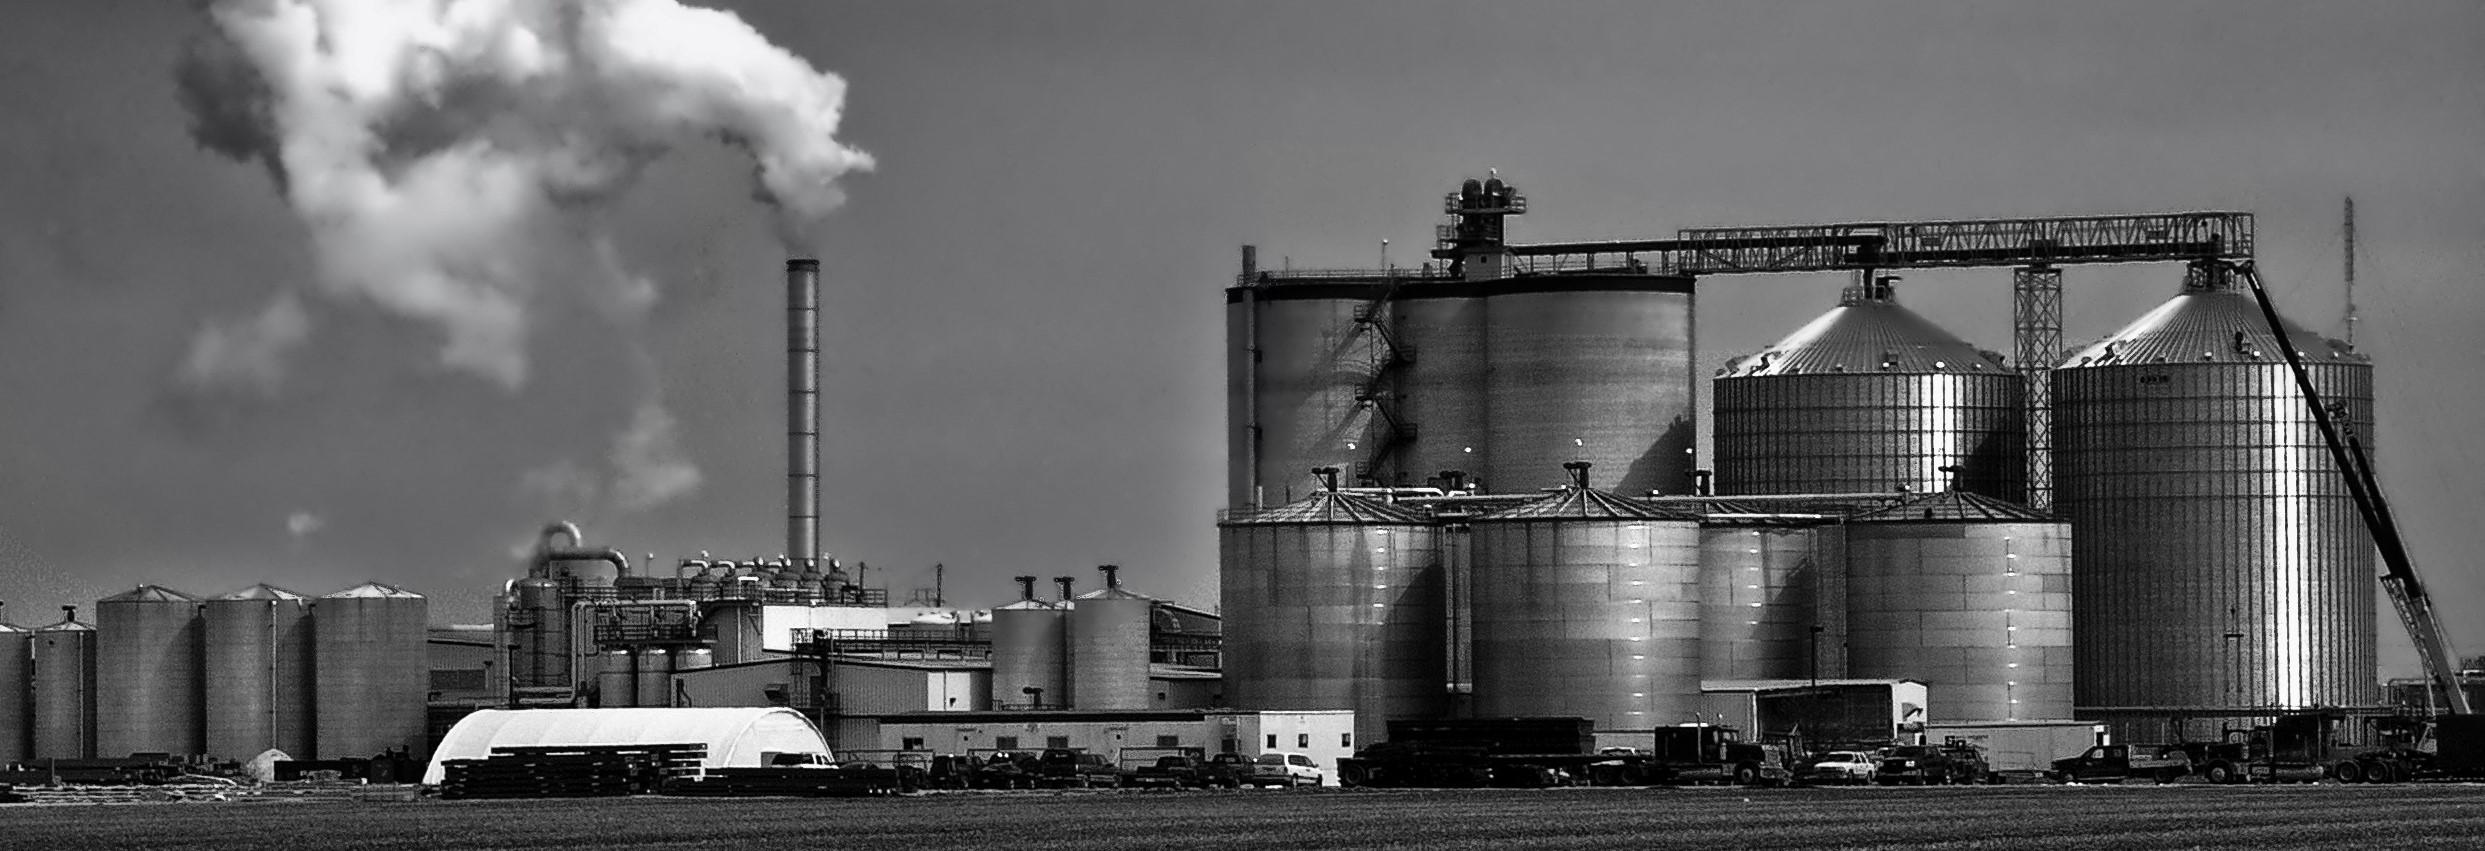 ethanol Cropped.jpg